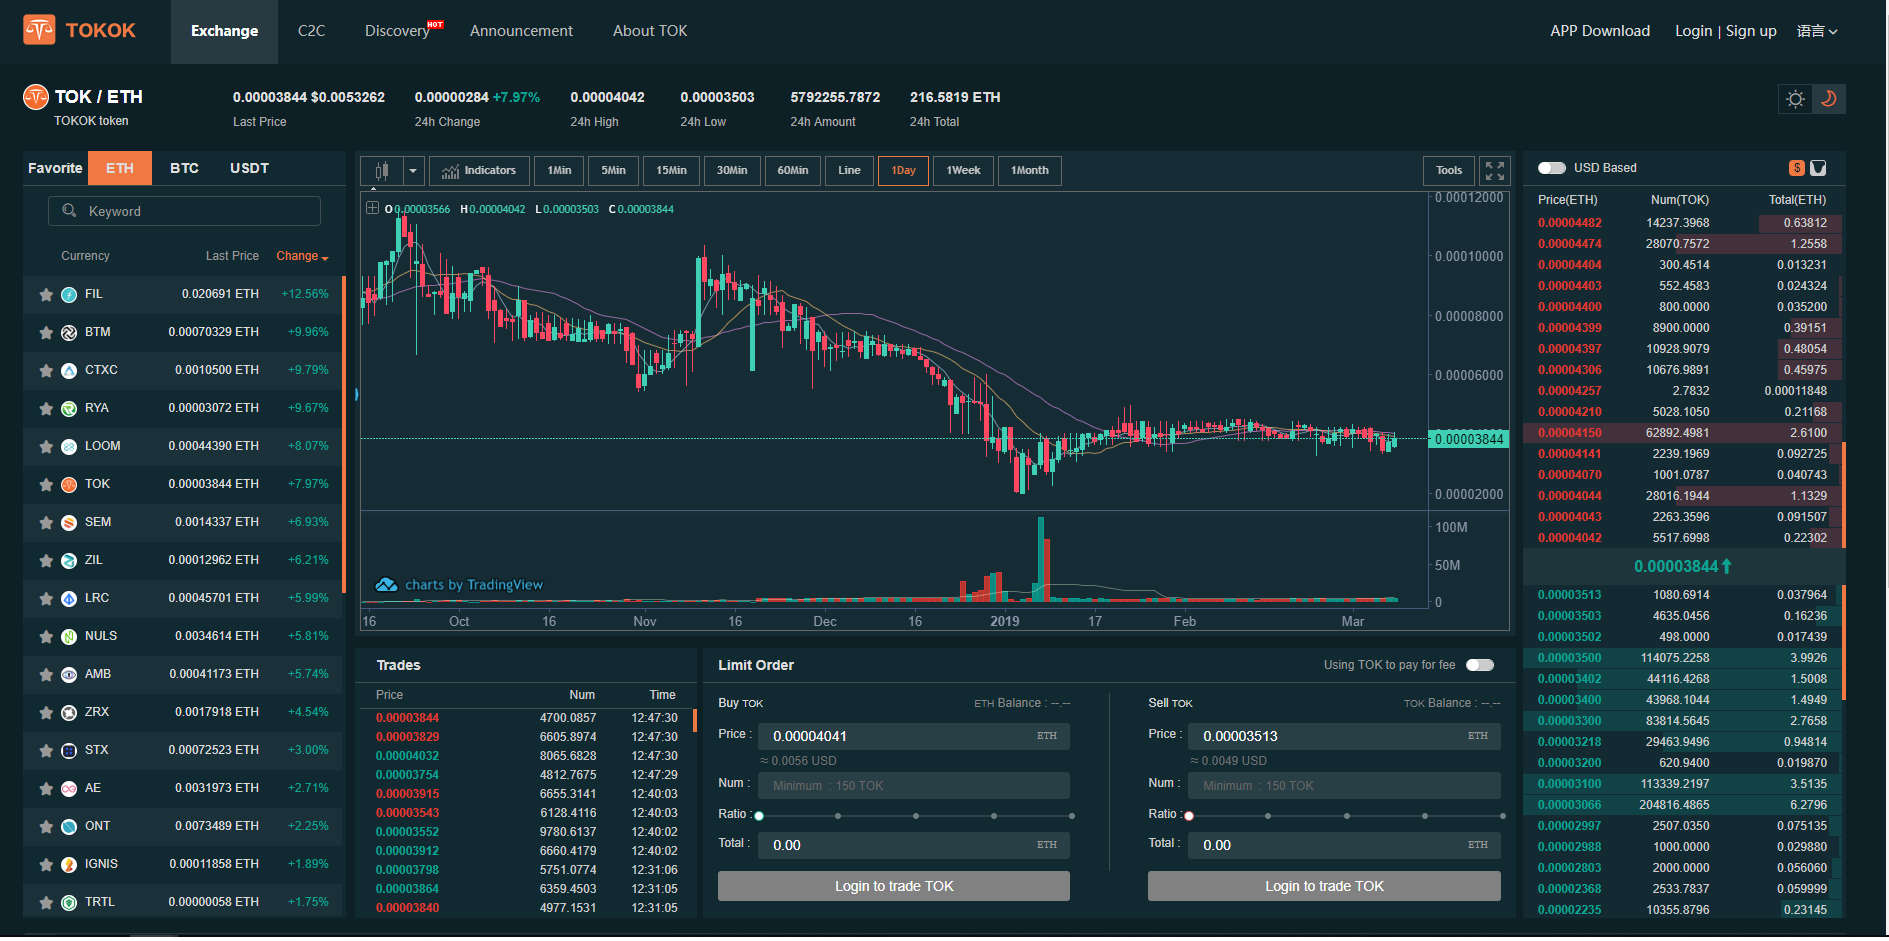 TOKOK Trading View